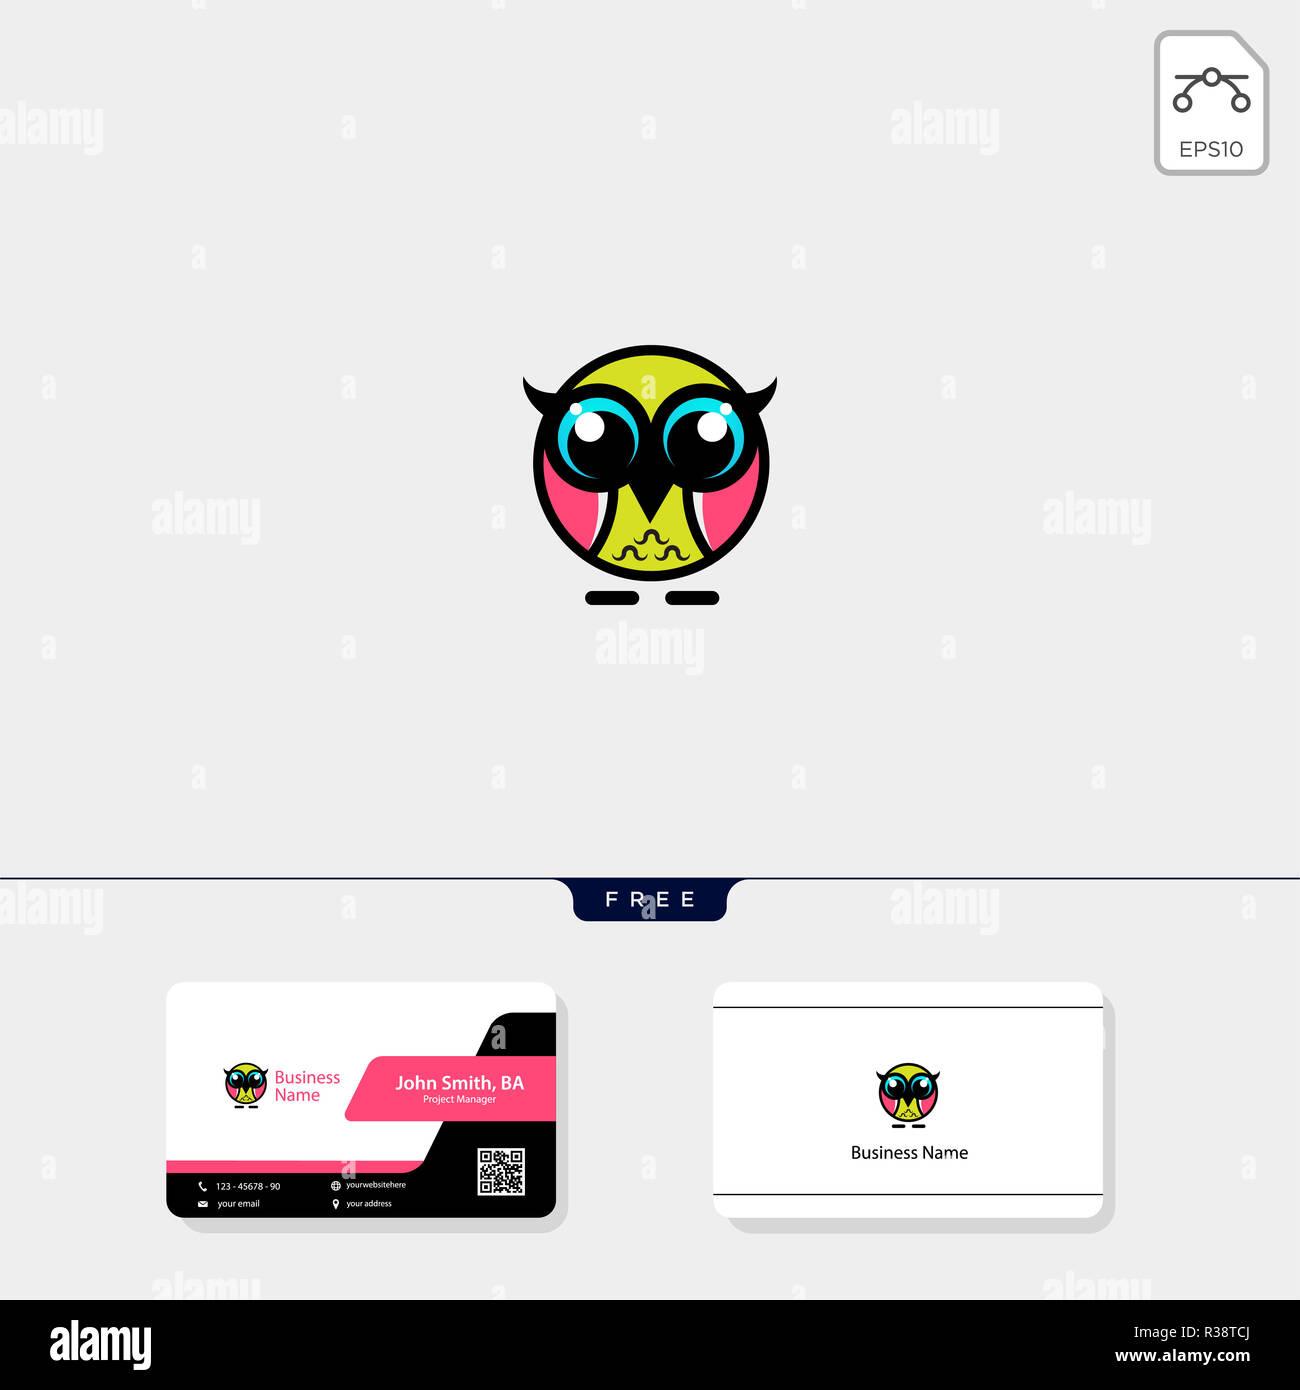 Cute Owl Modele Logo Vector Illustration De Conception Carte Visite Gratuit